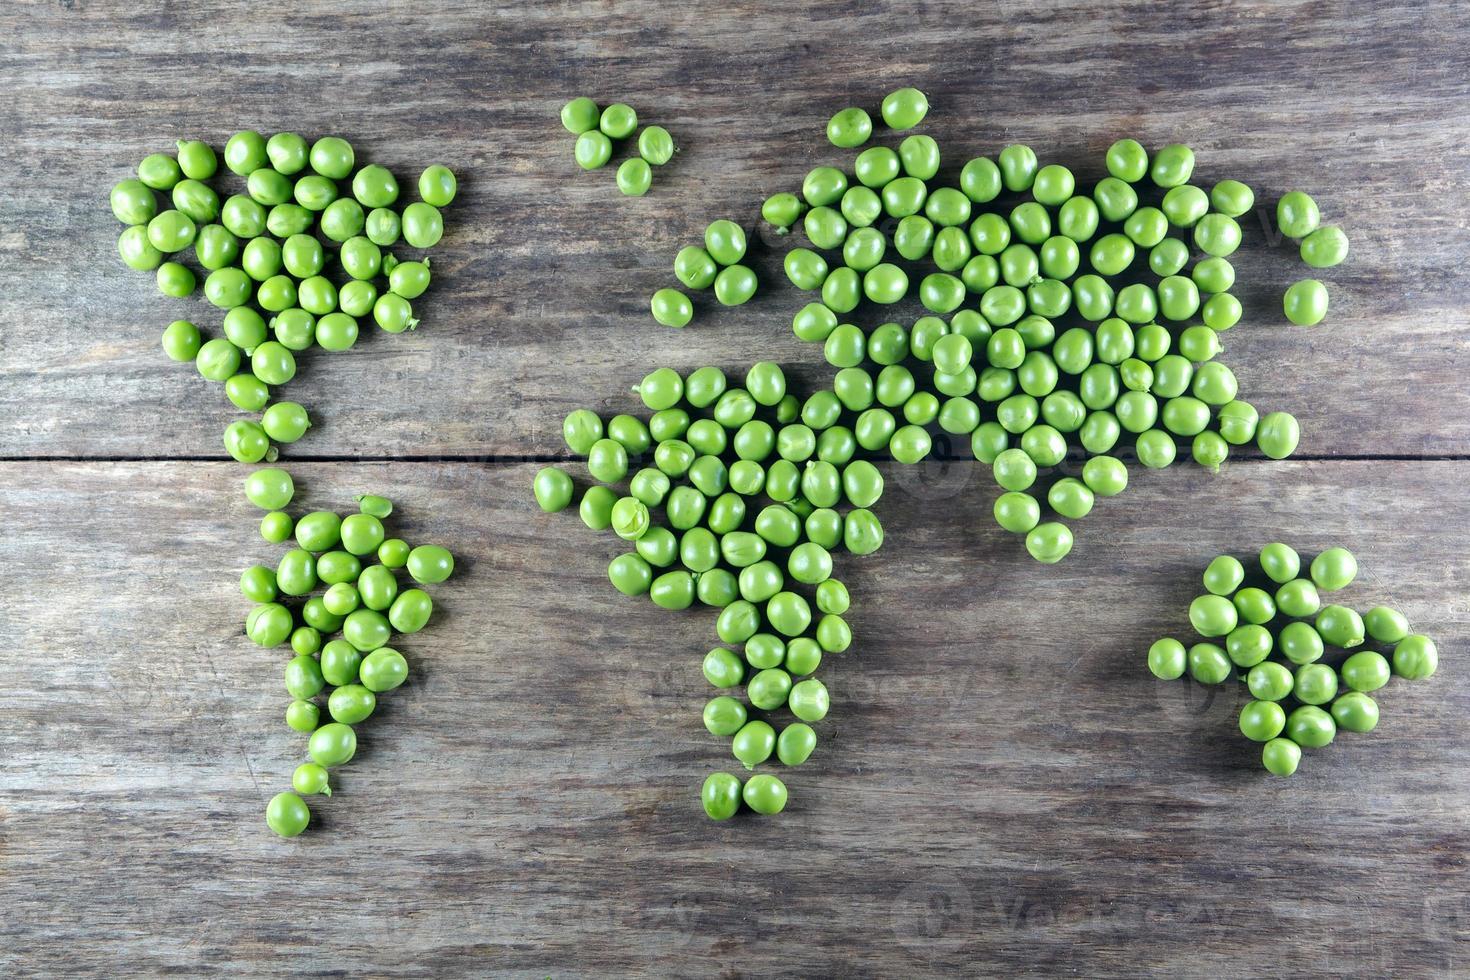 world map made form  peas photo